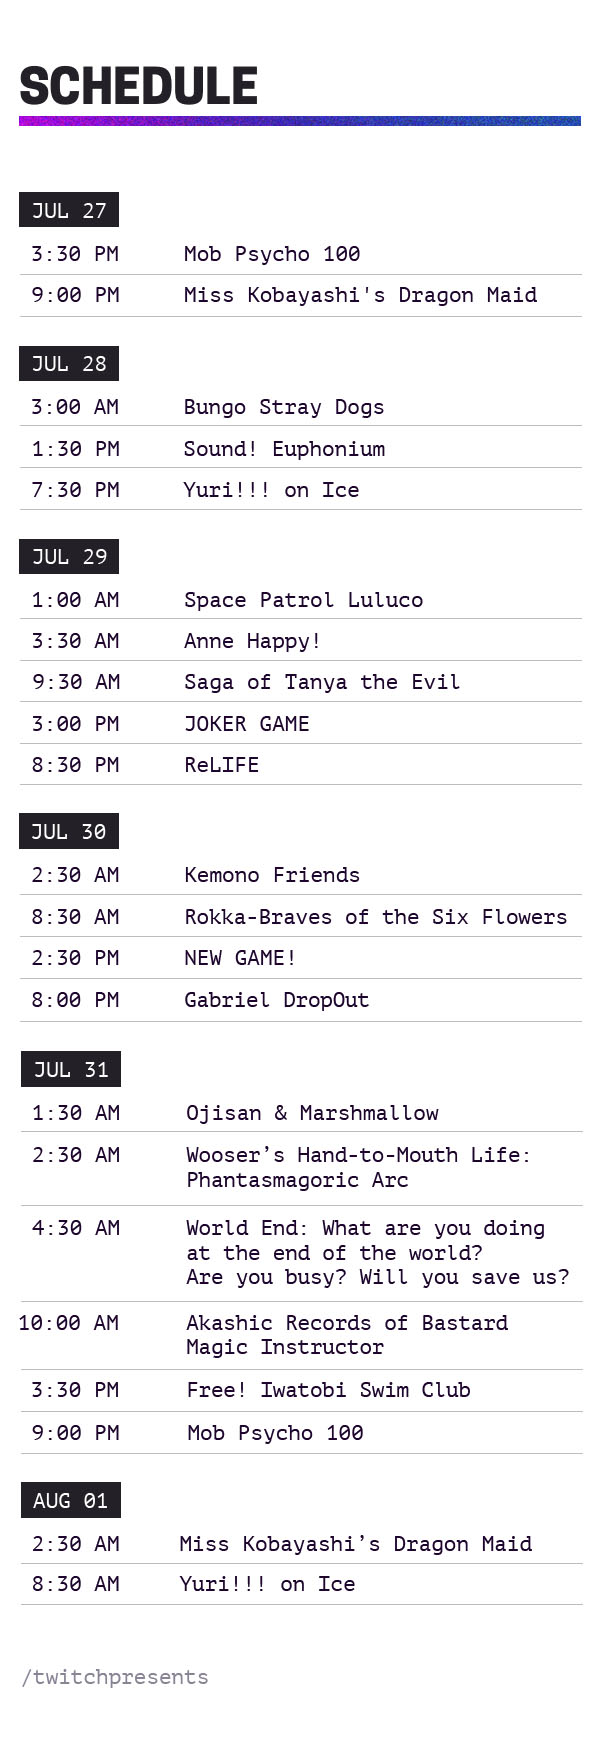 Twitch Crunchyroll Lineup